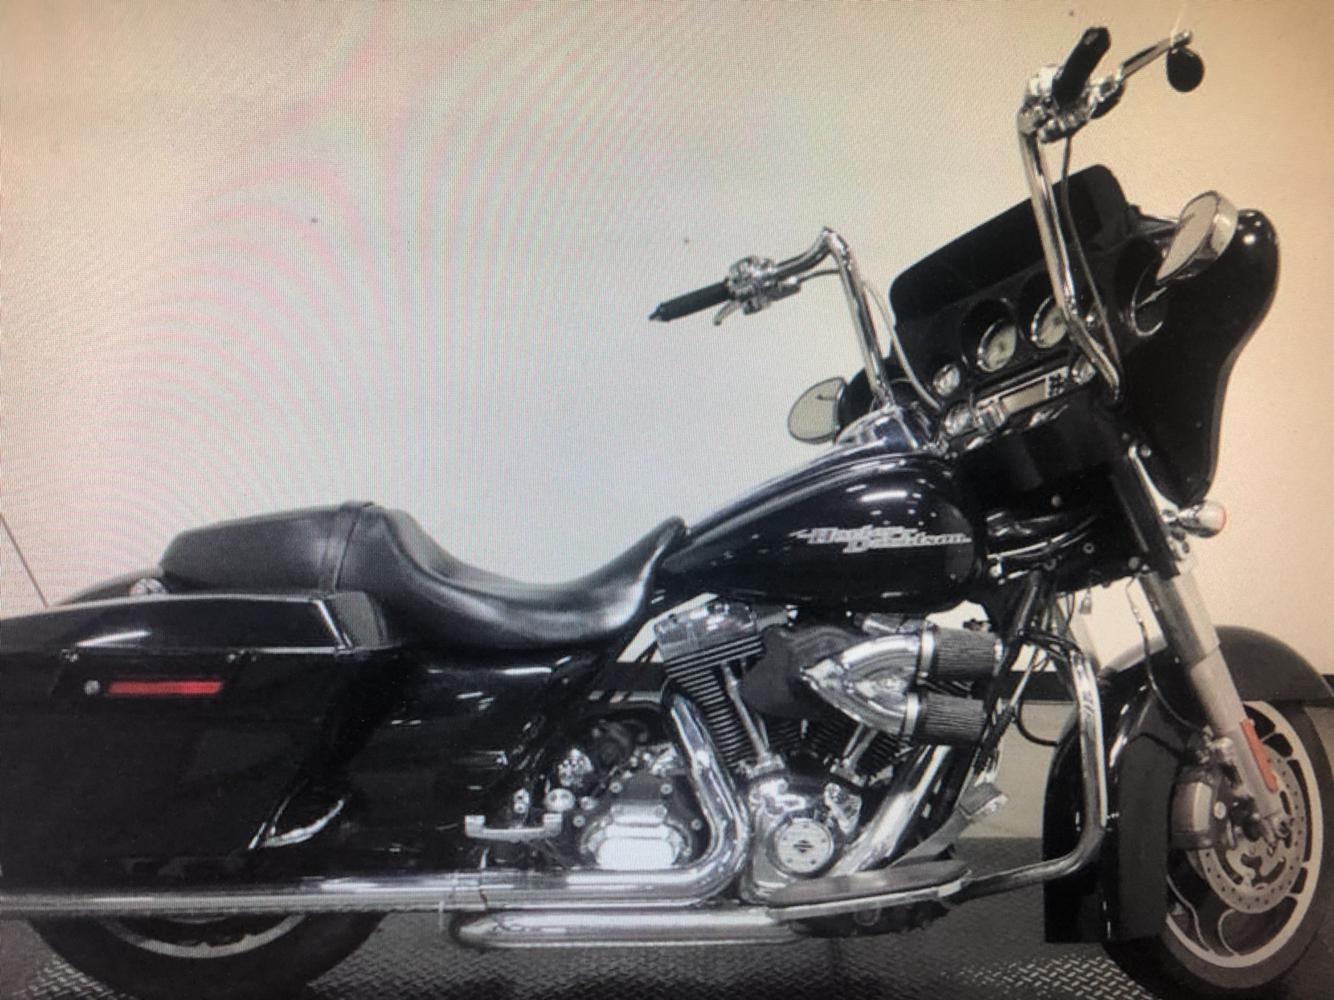 2011 Harley-Davidson® FLHX-103 STREET GLIDE